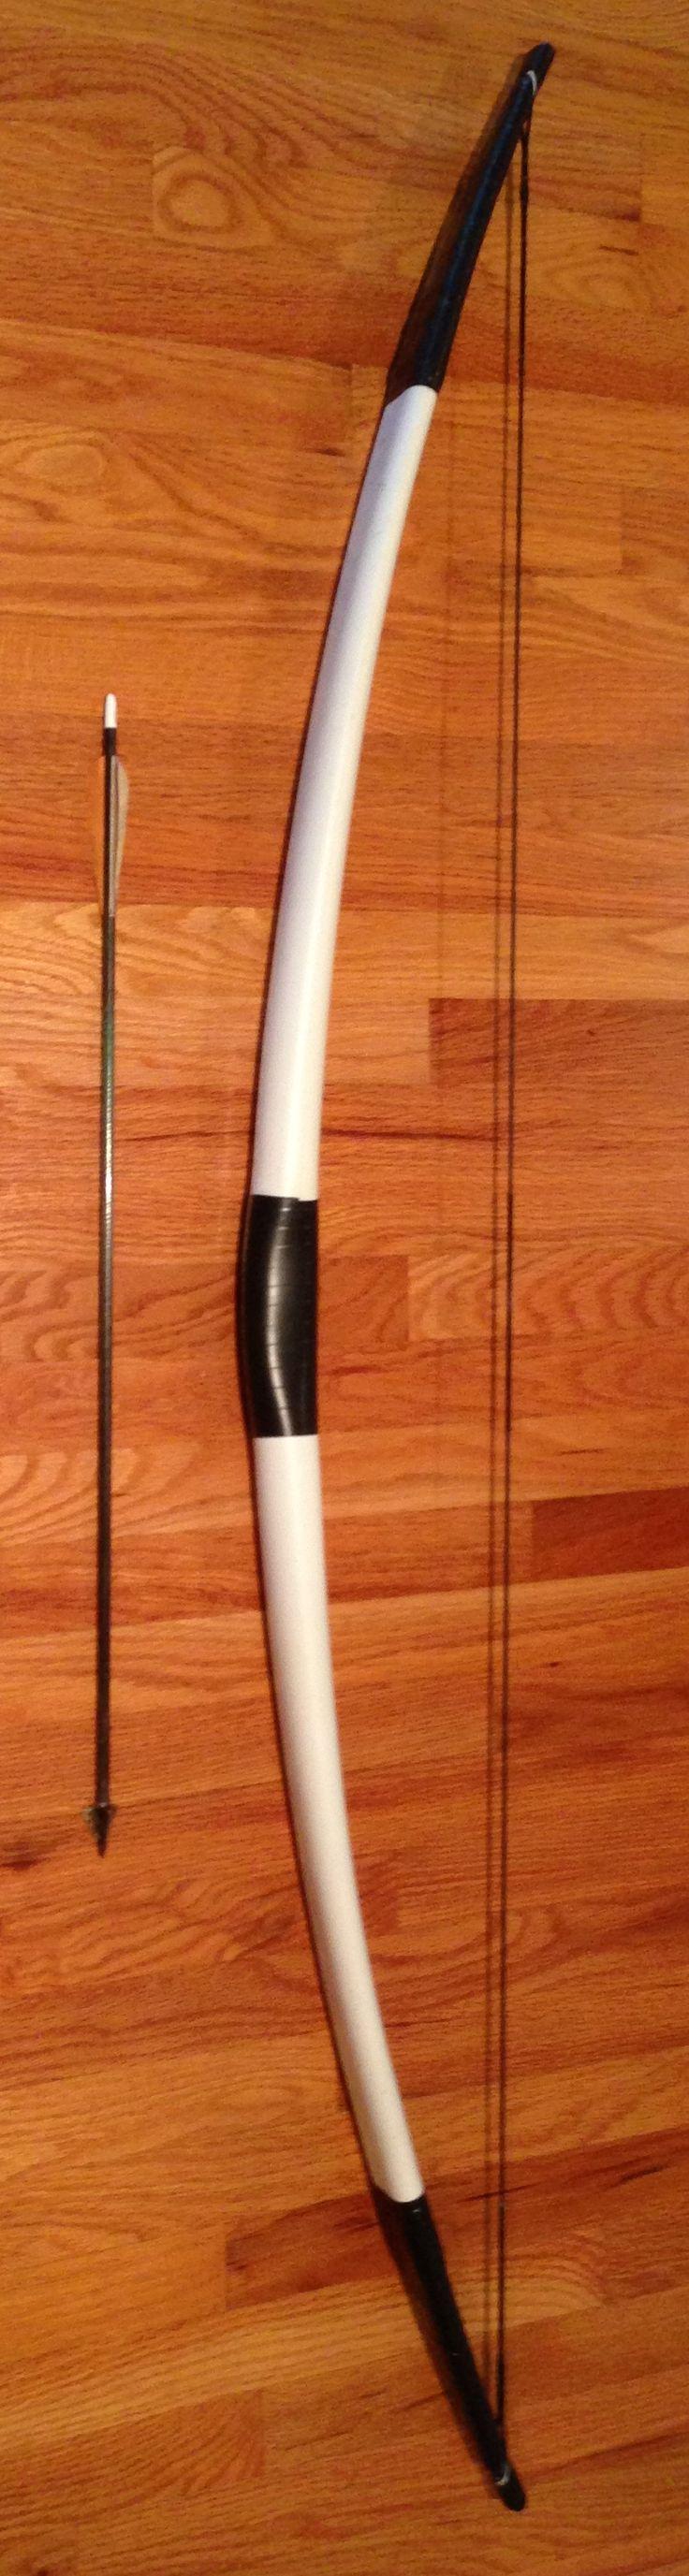 139 best bows u0026 crossbows images on pinterest diy crossbow